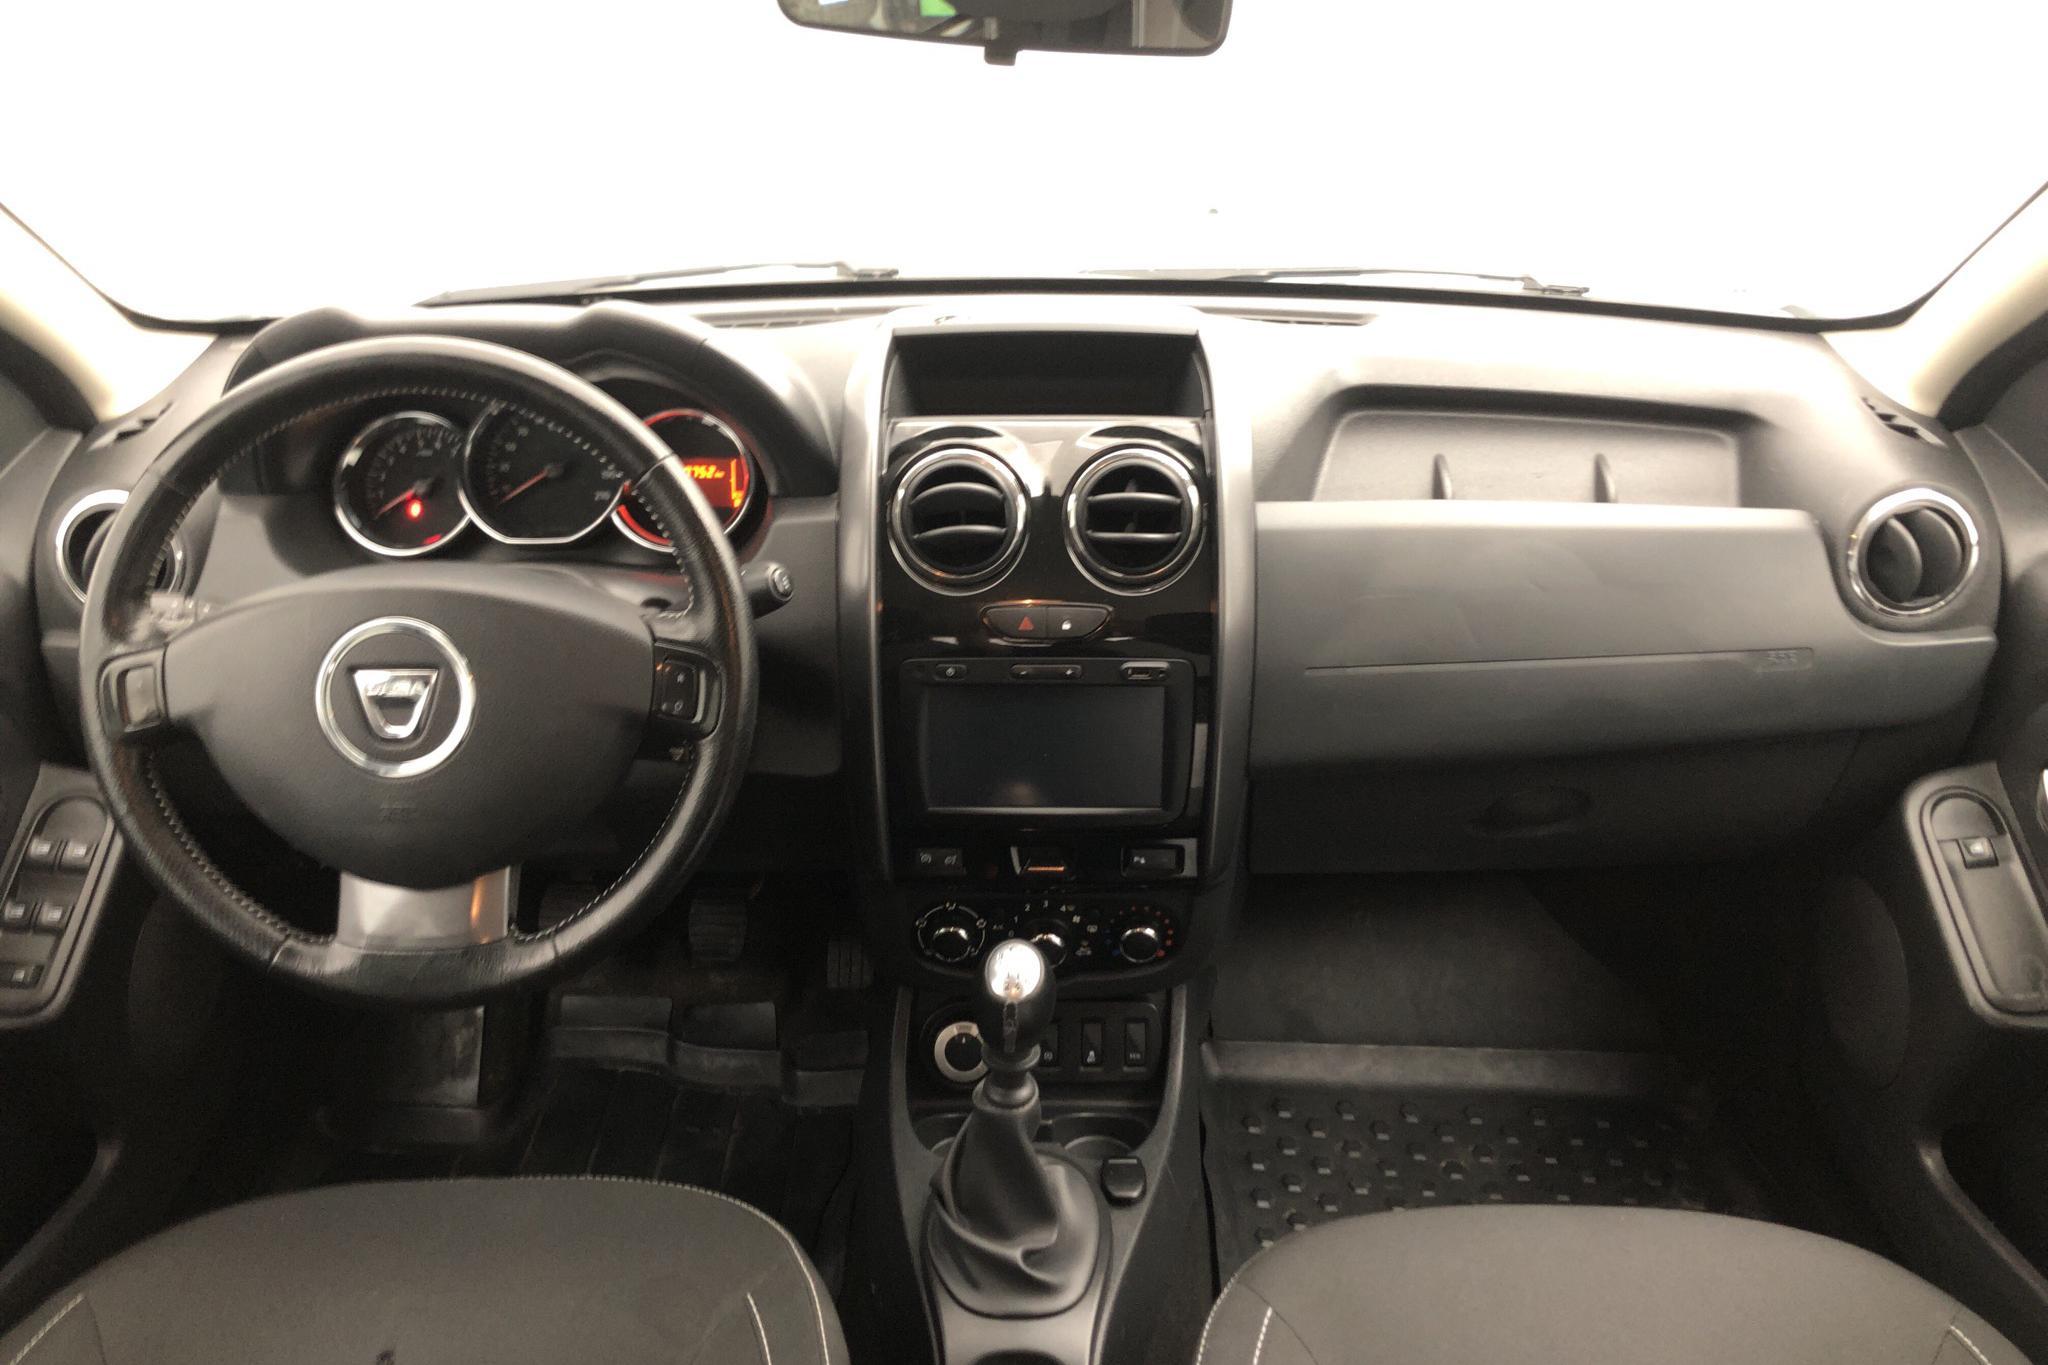 Dacia Duster 1.5 dCi 4x4 (109hk) - 110 750 km - Manual - white - 2017